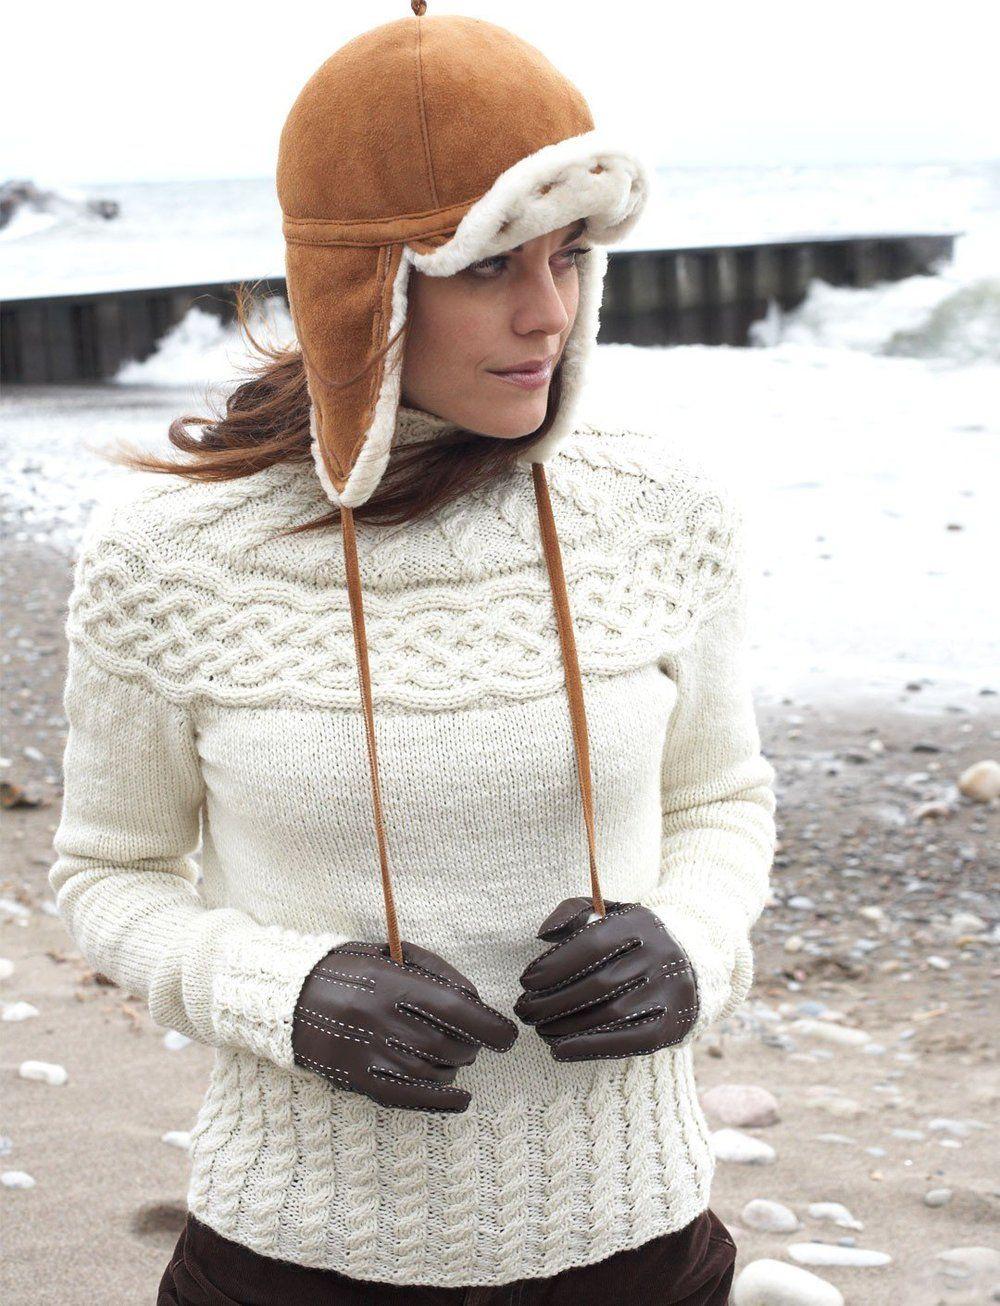 Winter Wonder Cabled Yoke Sweater | Tejido, Hilo y Lana